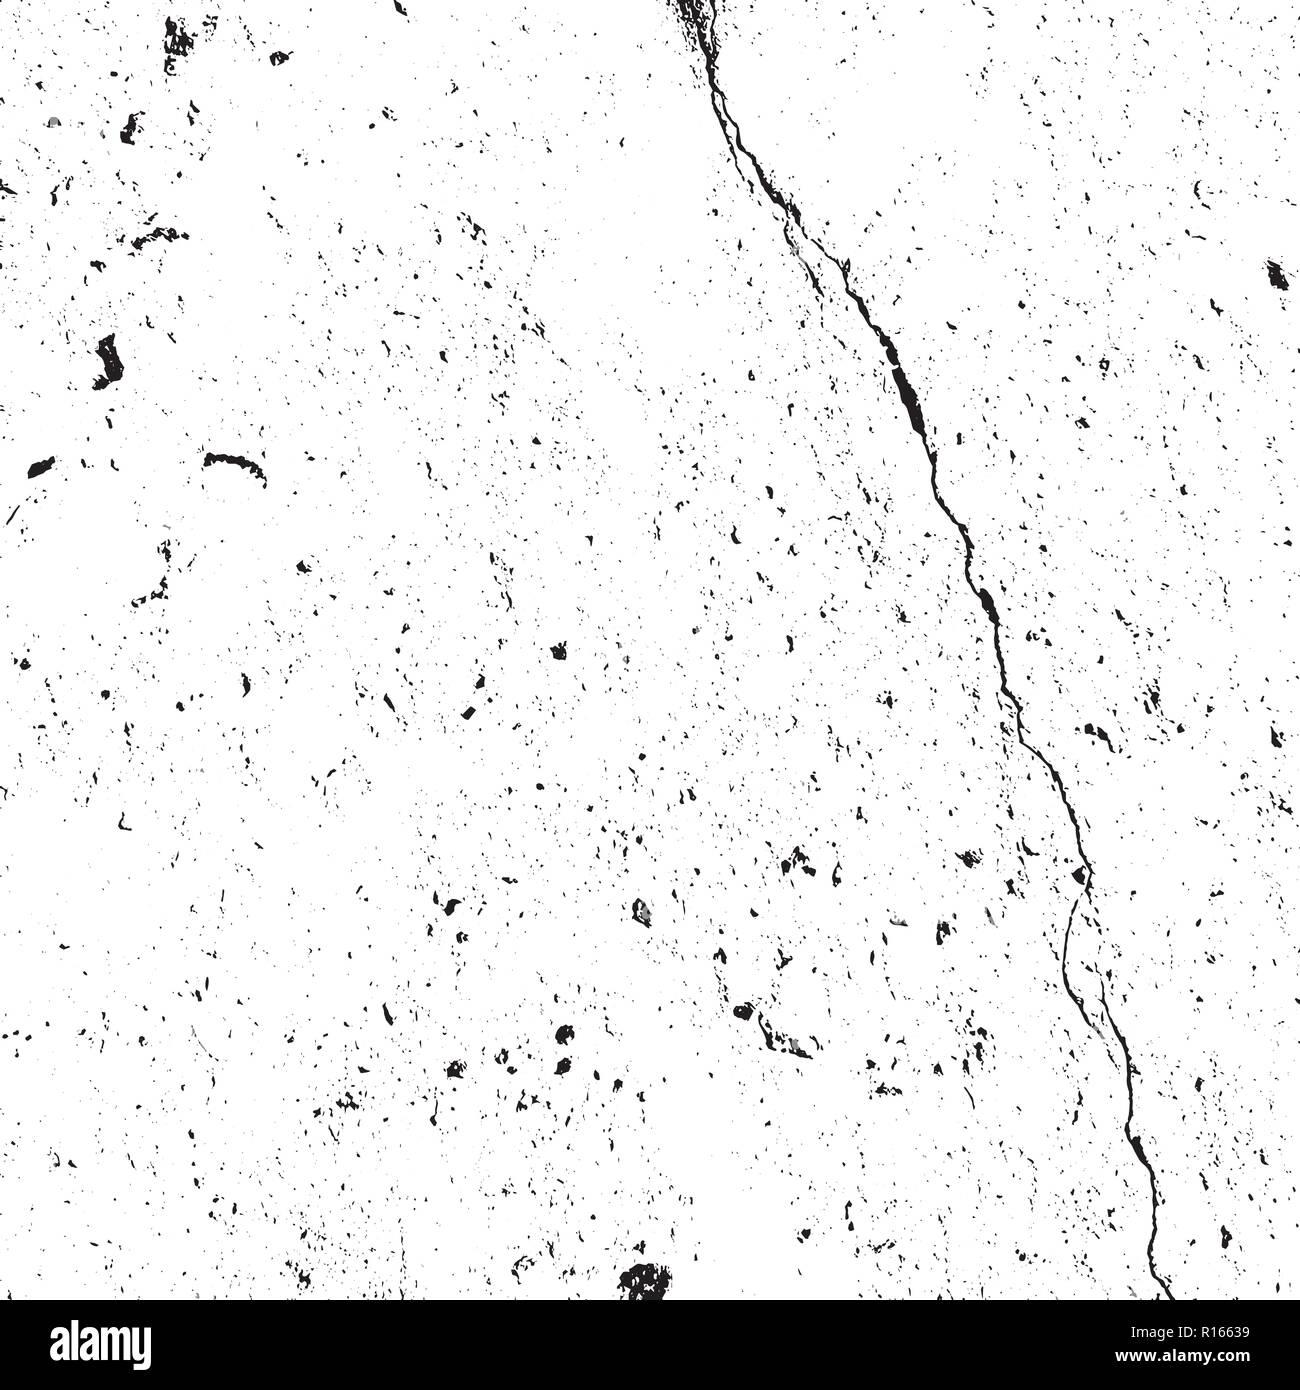 Grunge Dark Corner Messy Background Dirty Paper Empty Cover